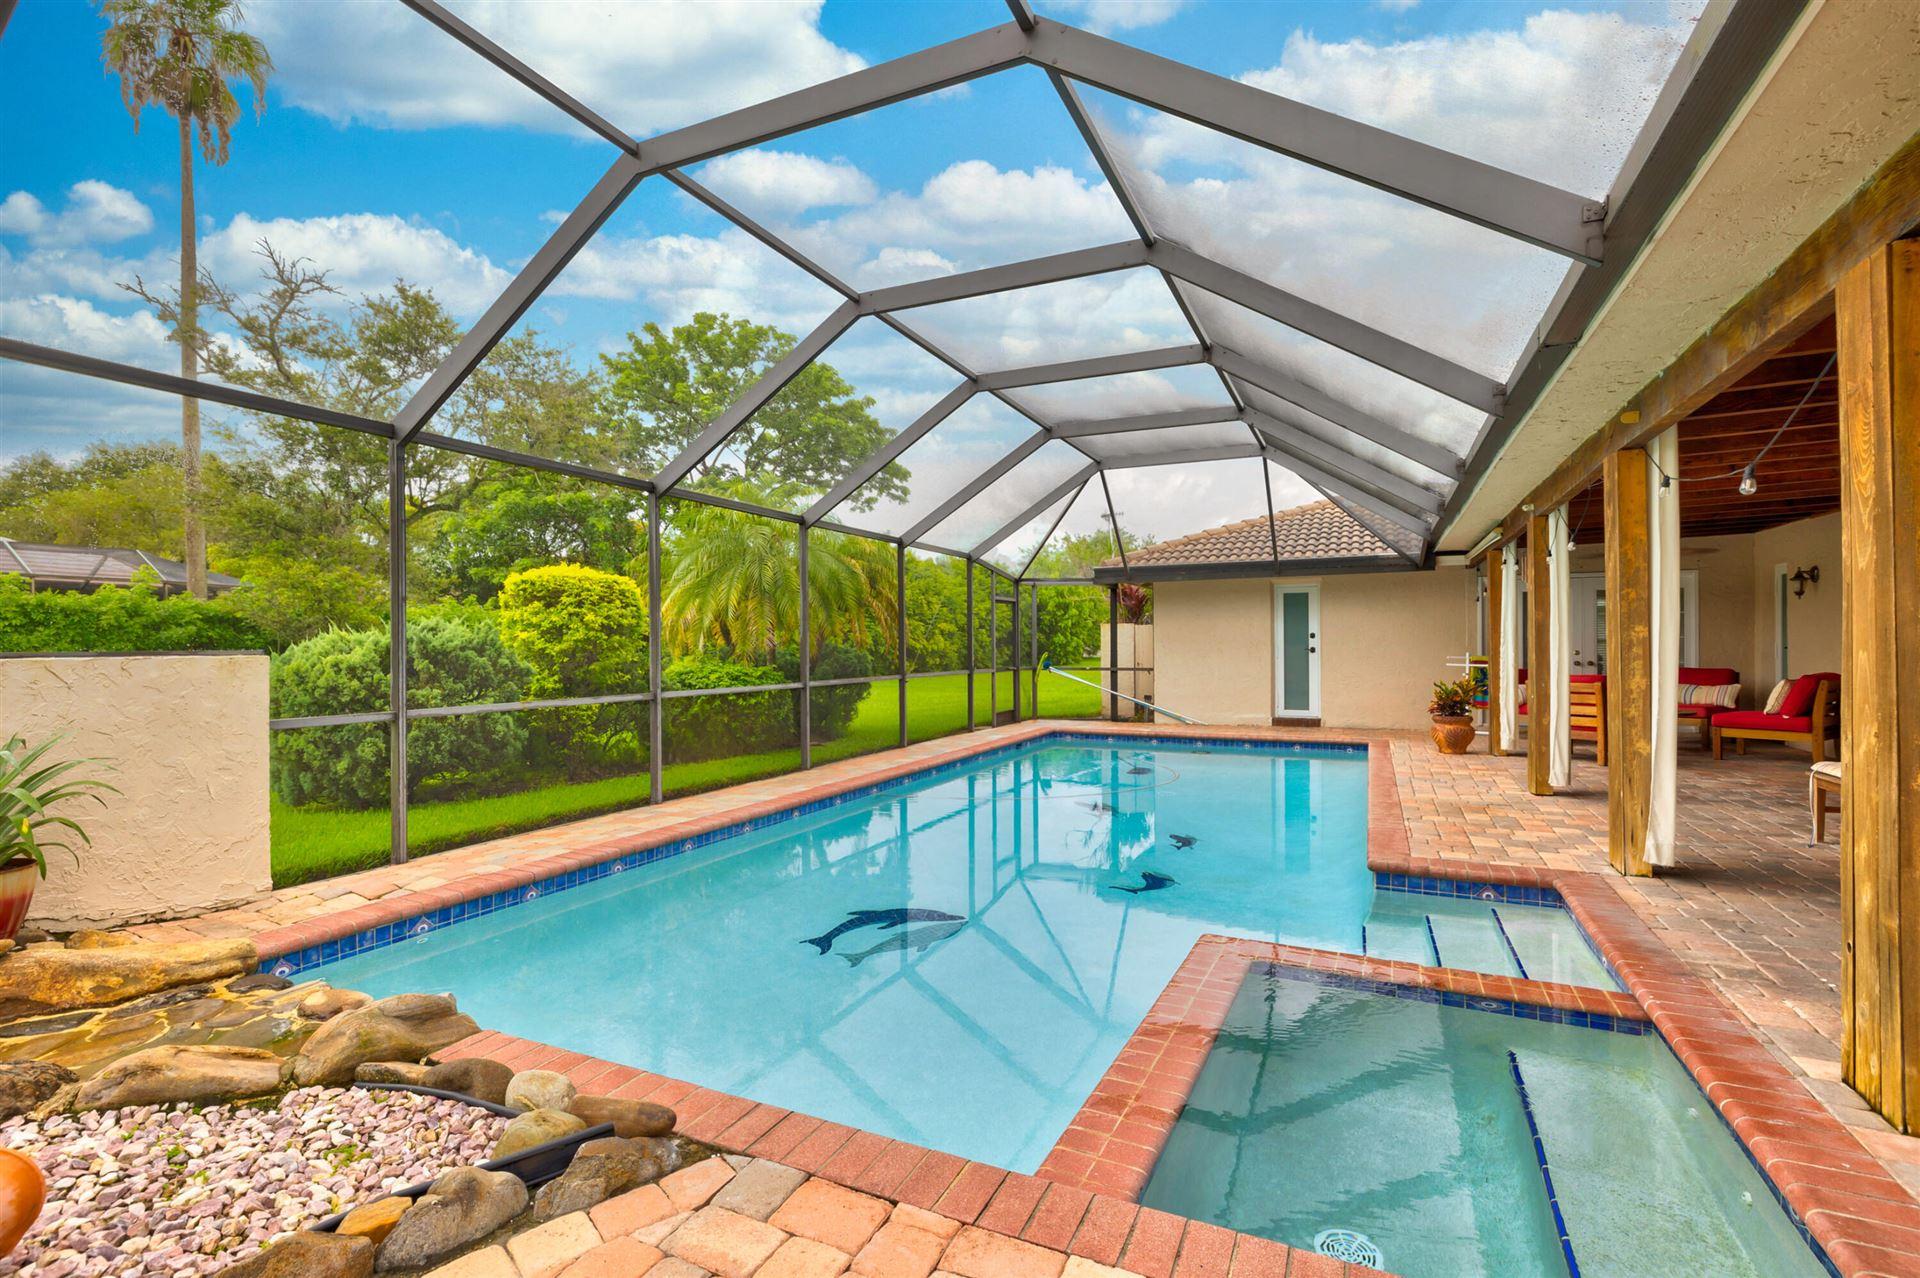 660 NW 101 Terrace, Coral Springs, FL 33071 - MLS#: RX-10731148